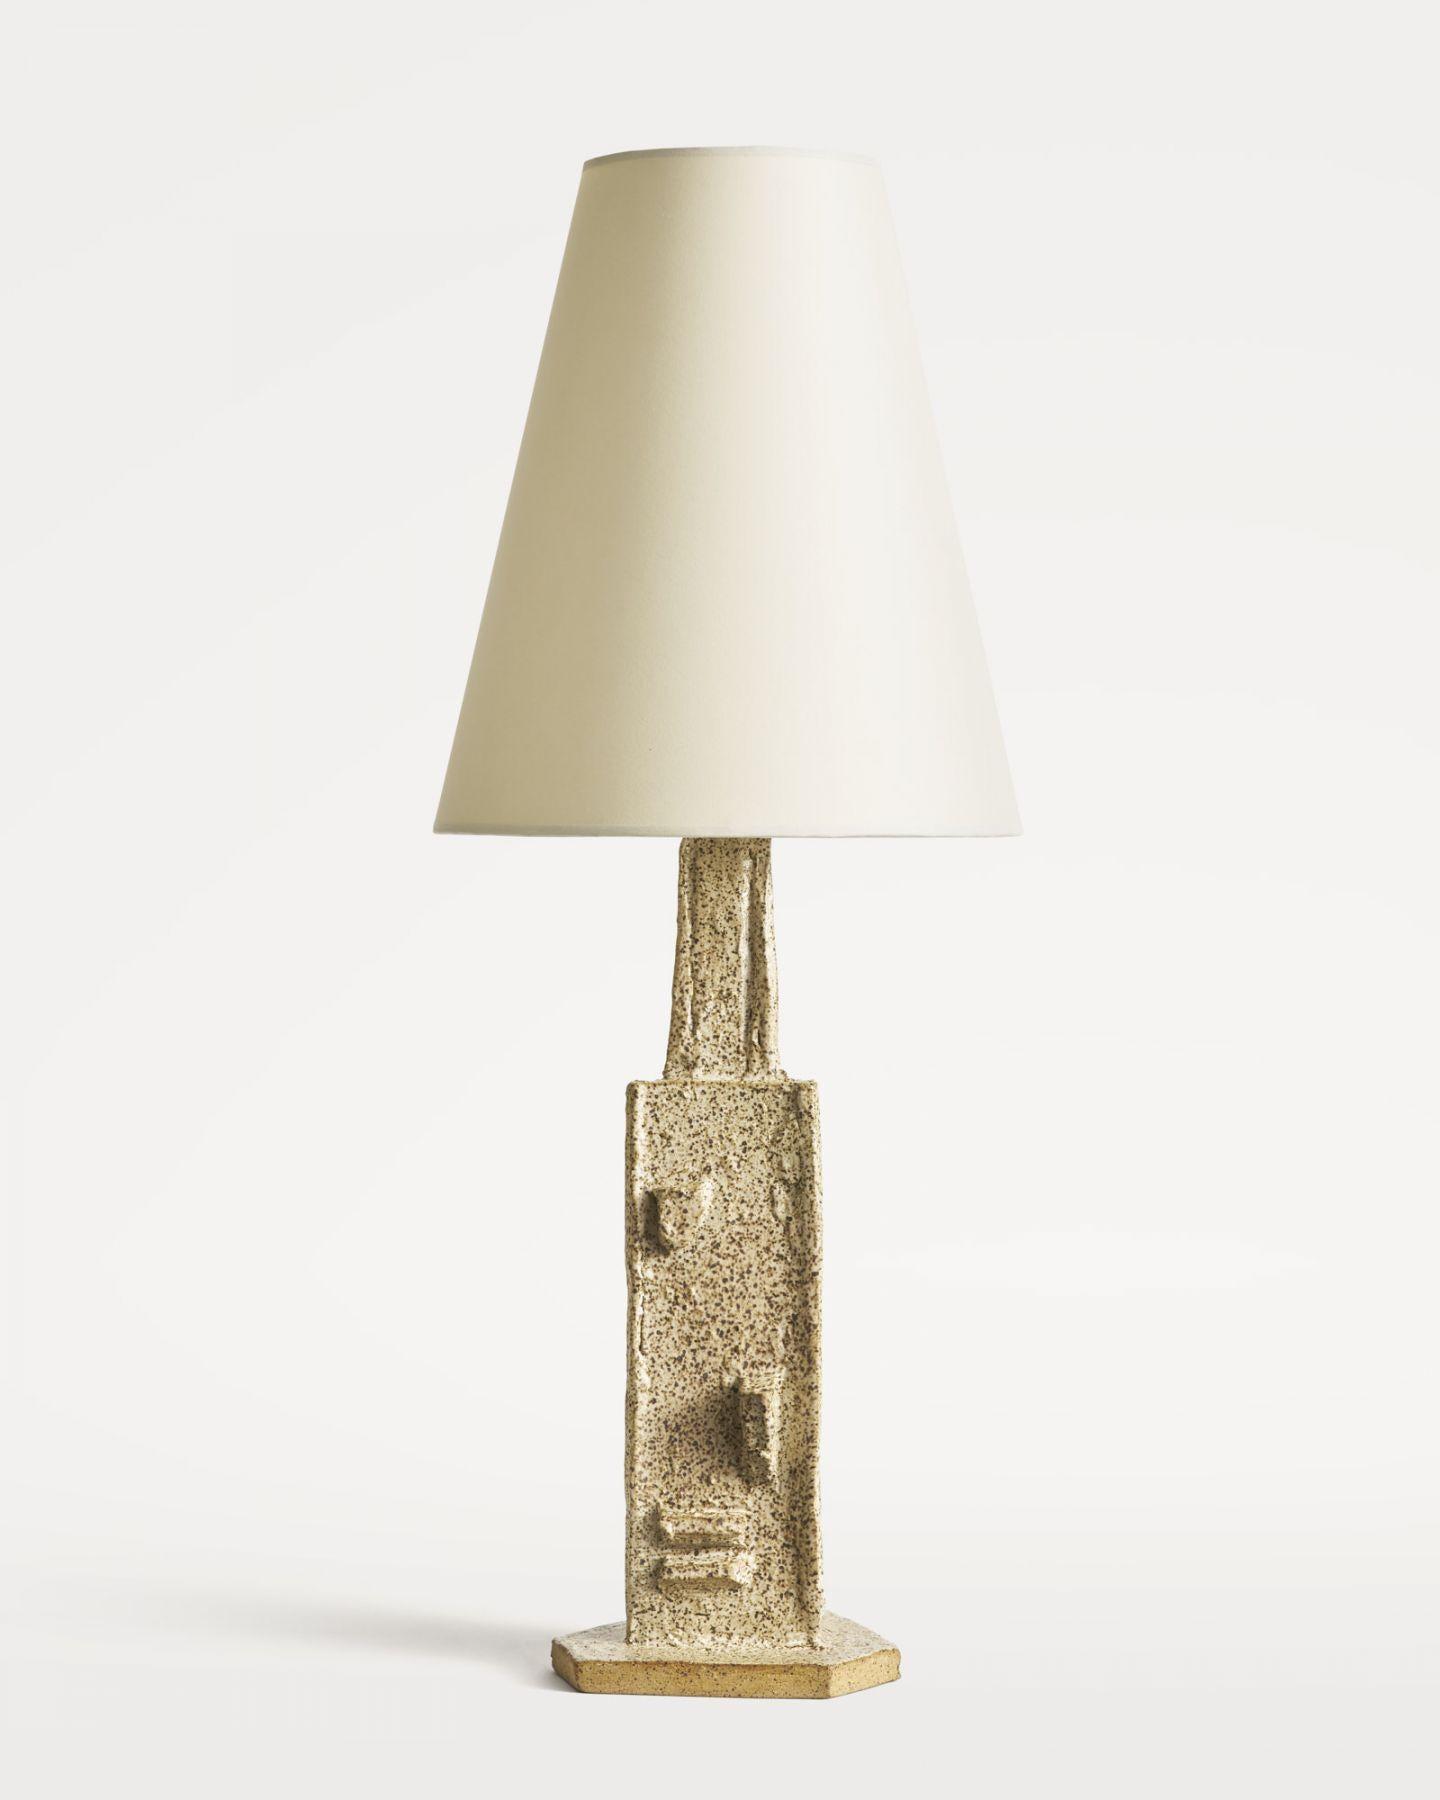 Untitled Lamp